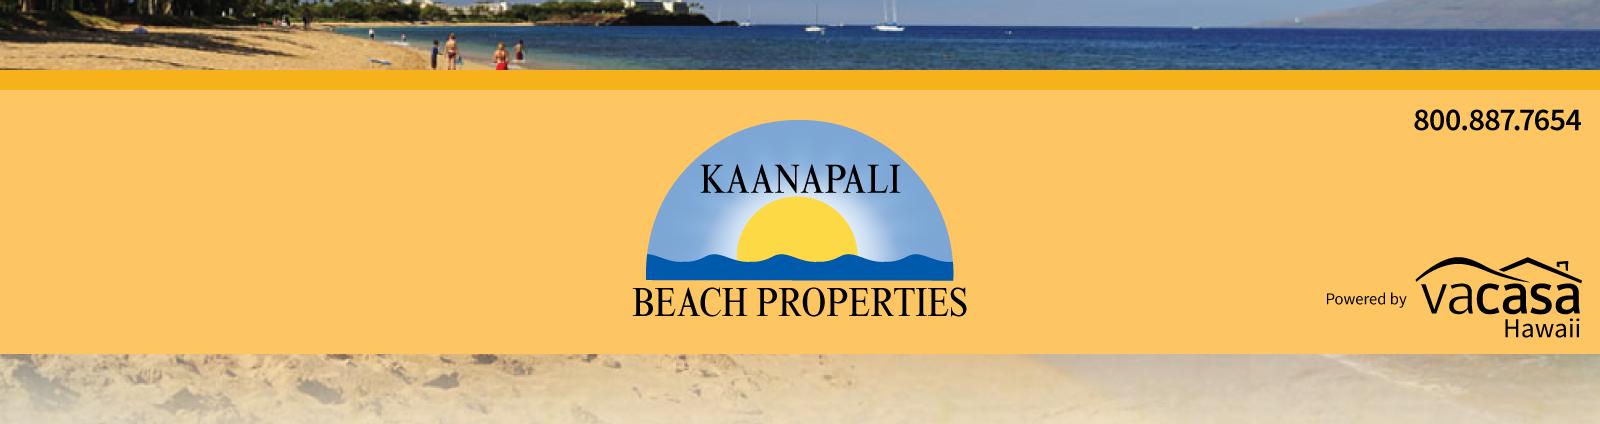 Kaanapali Beach Rentals